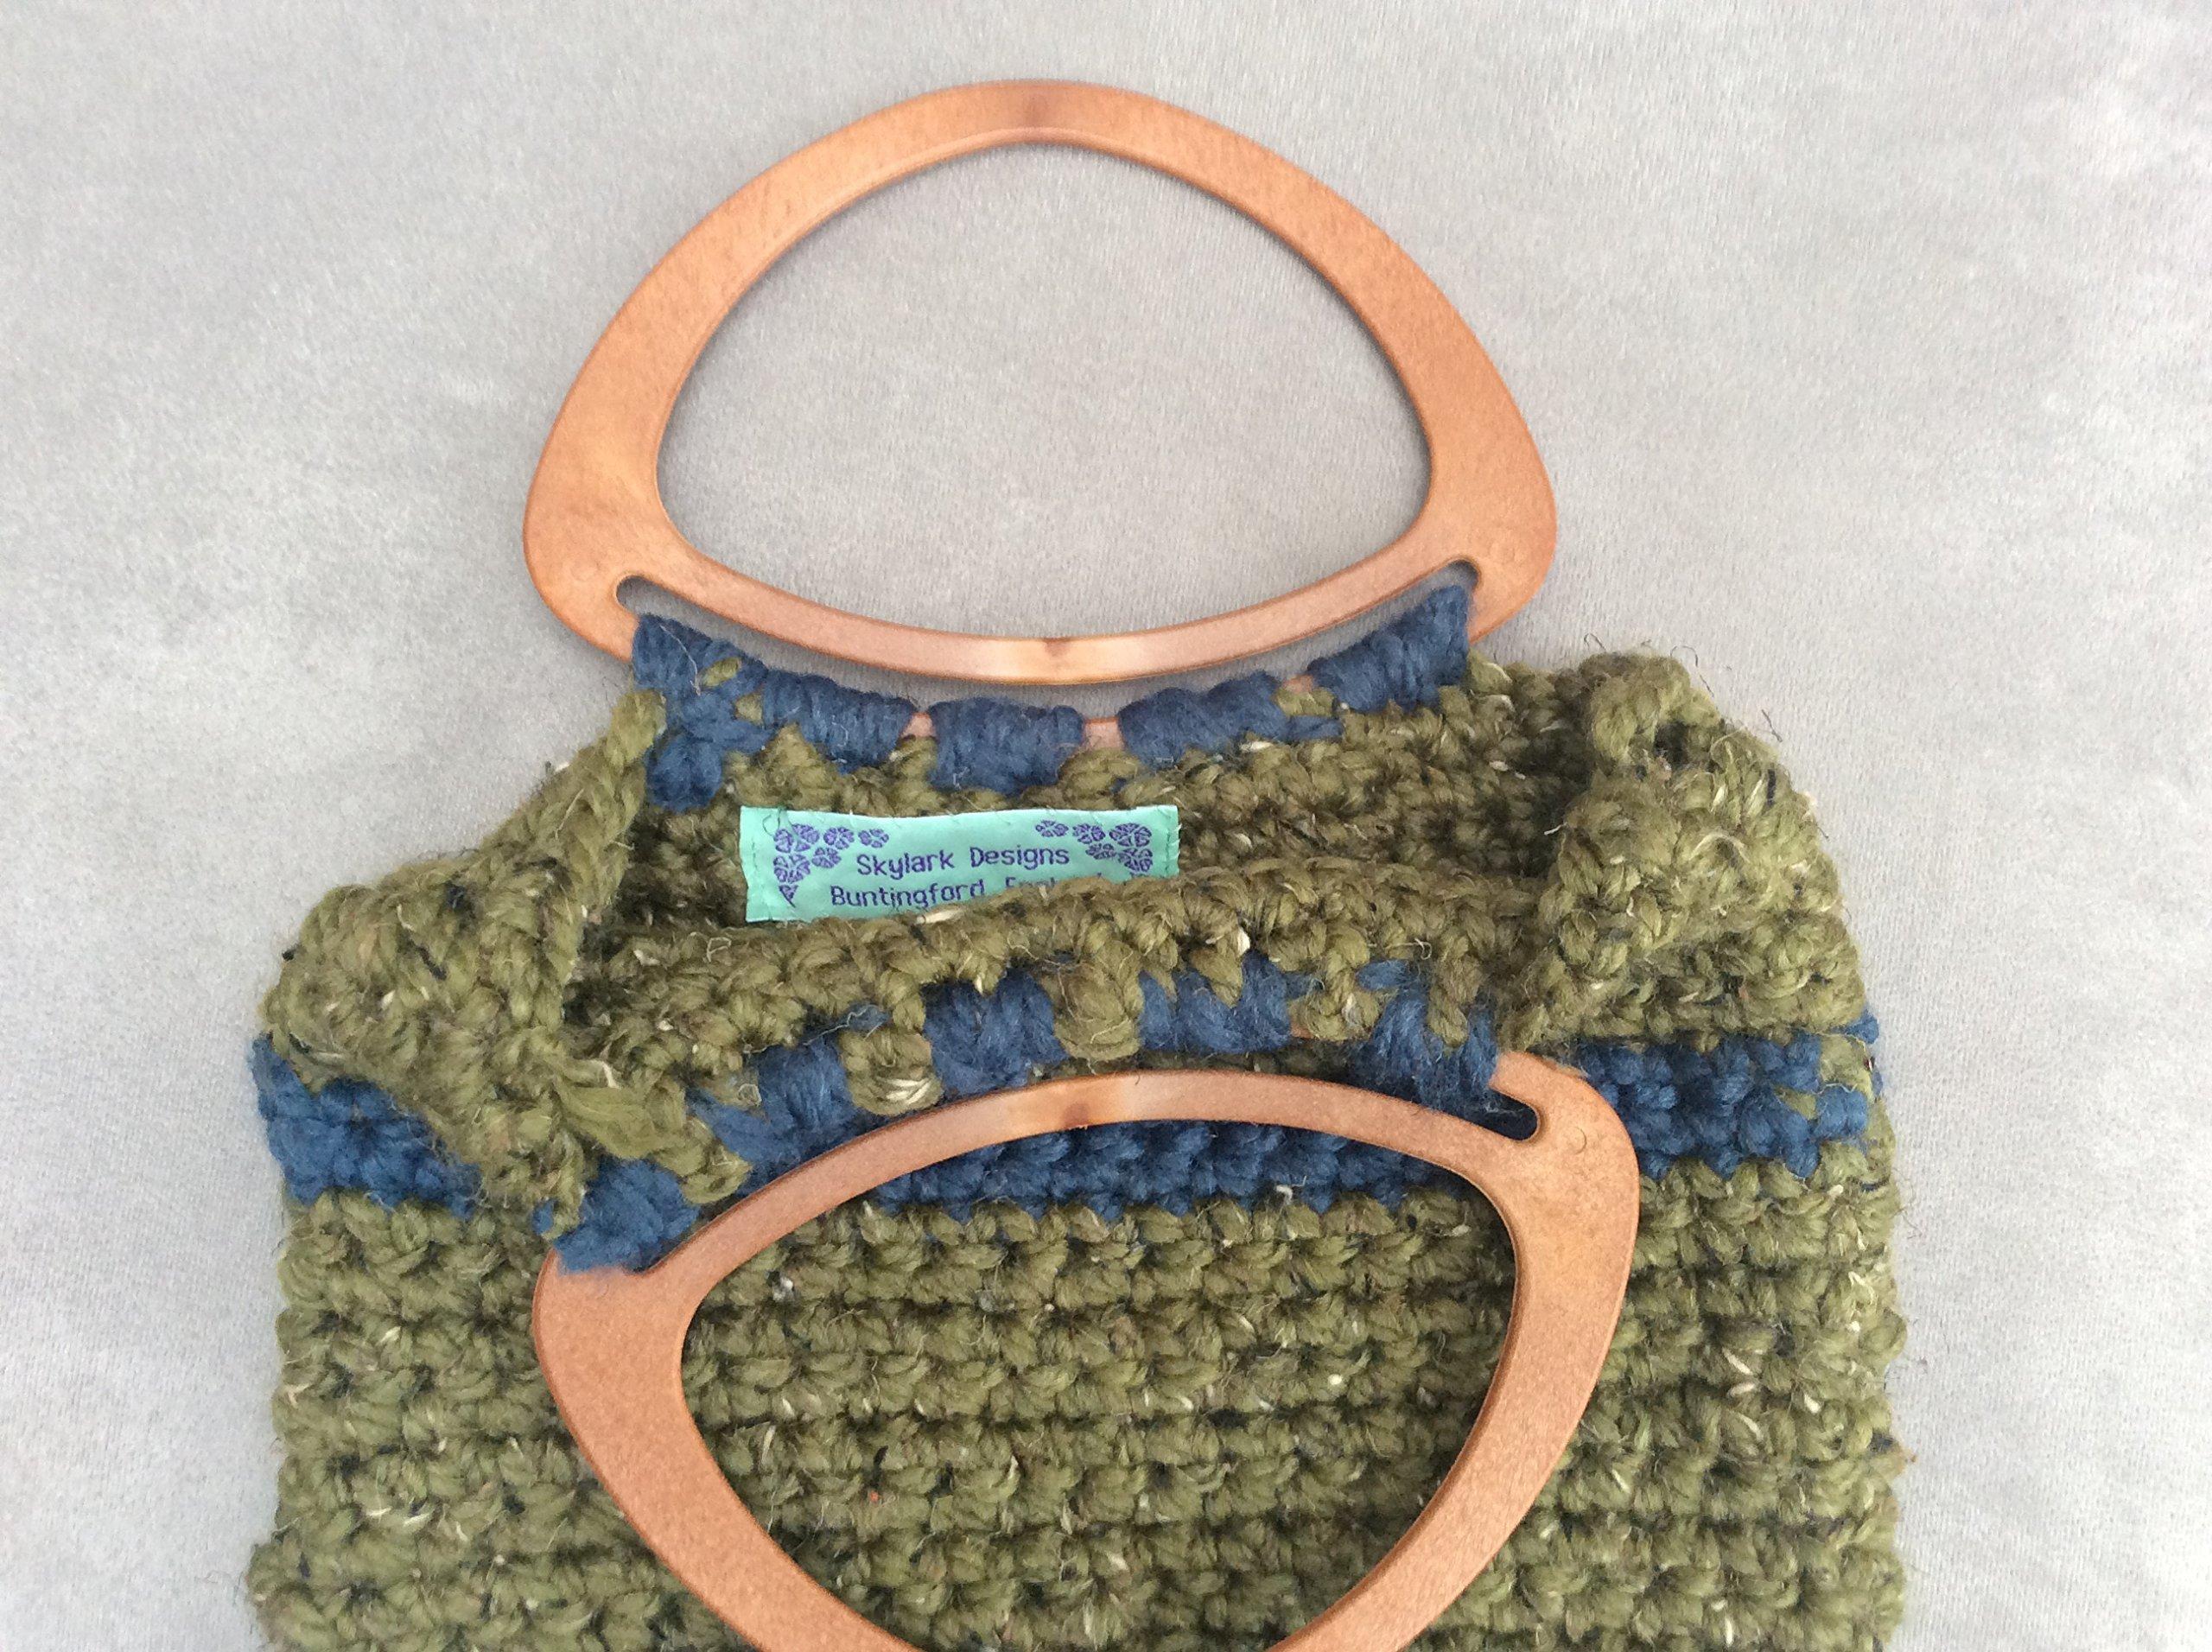 Rustic Crochet Handmade Handbag - handmade-bags